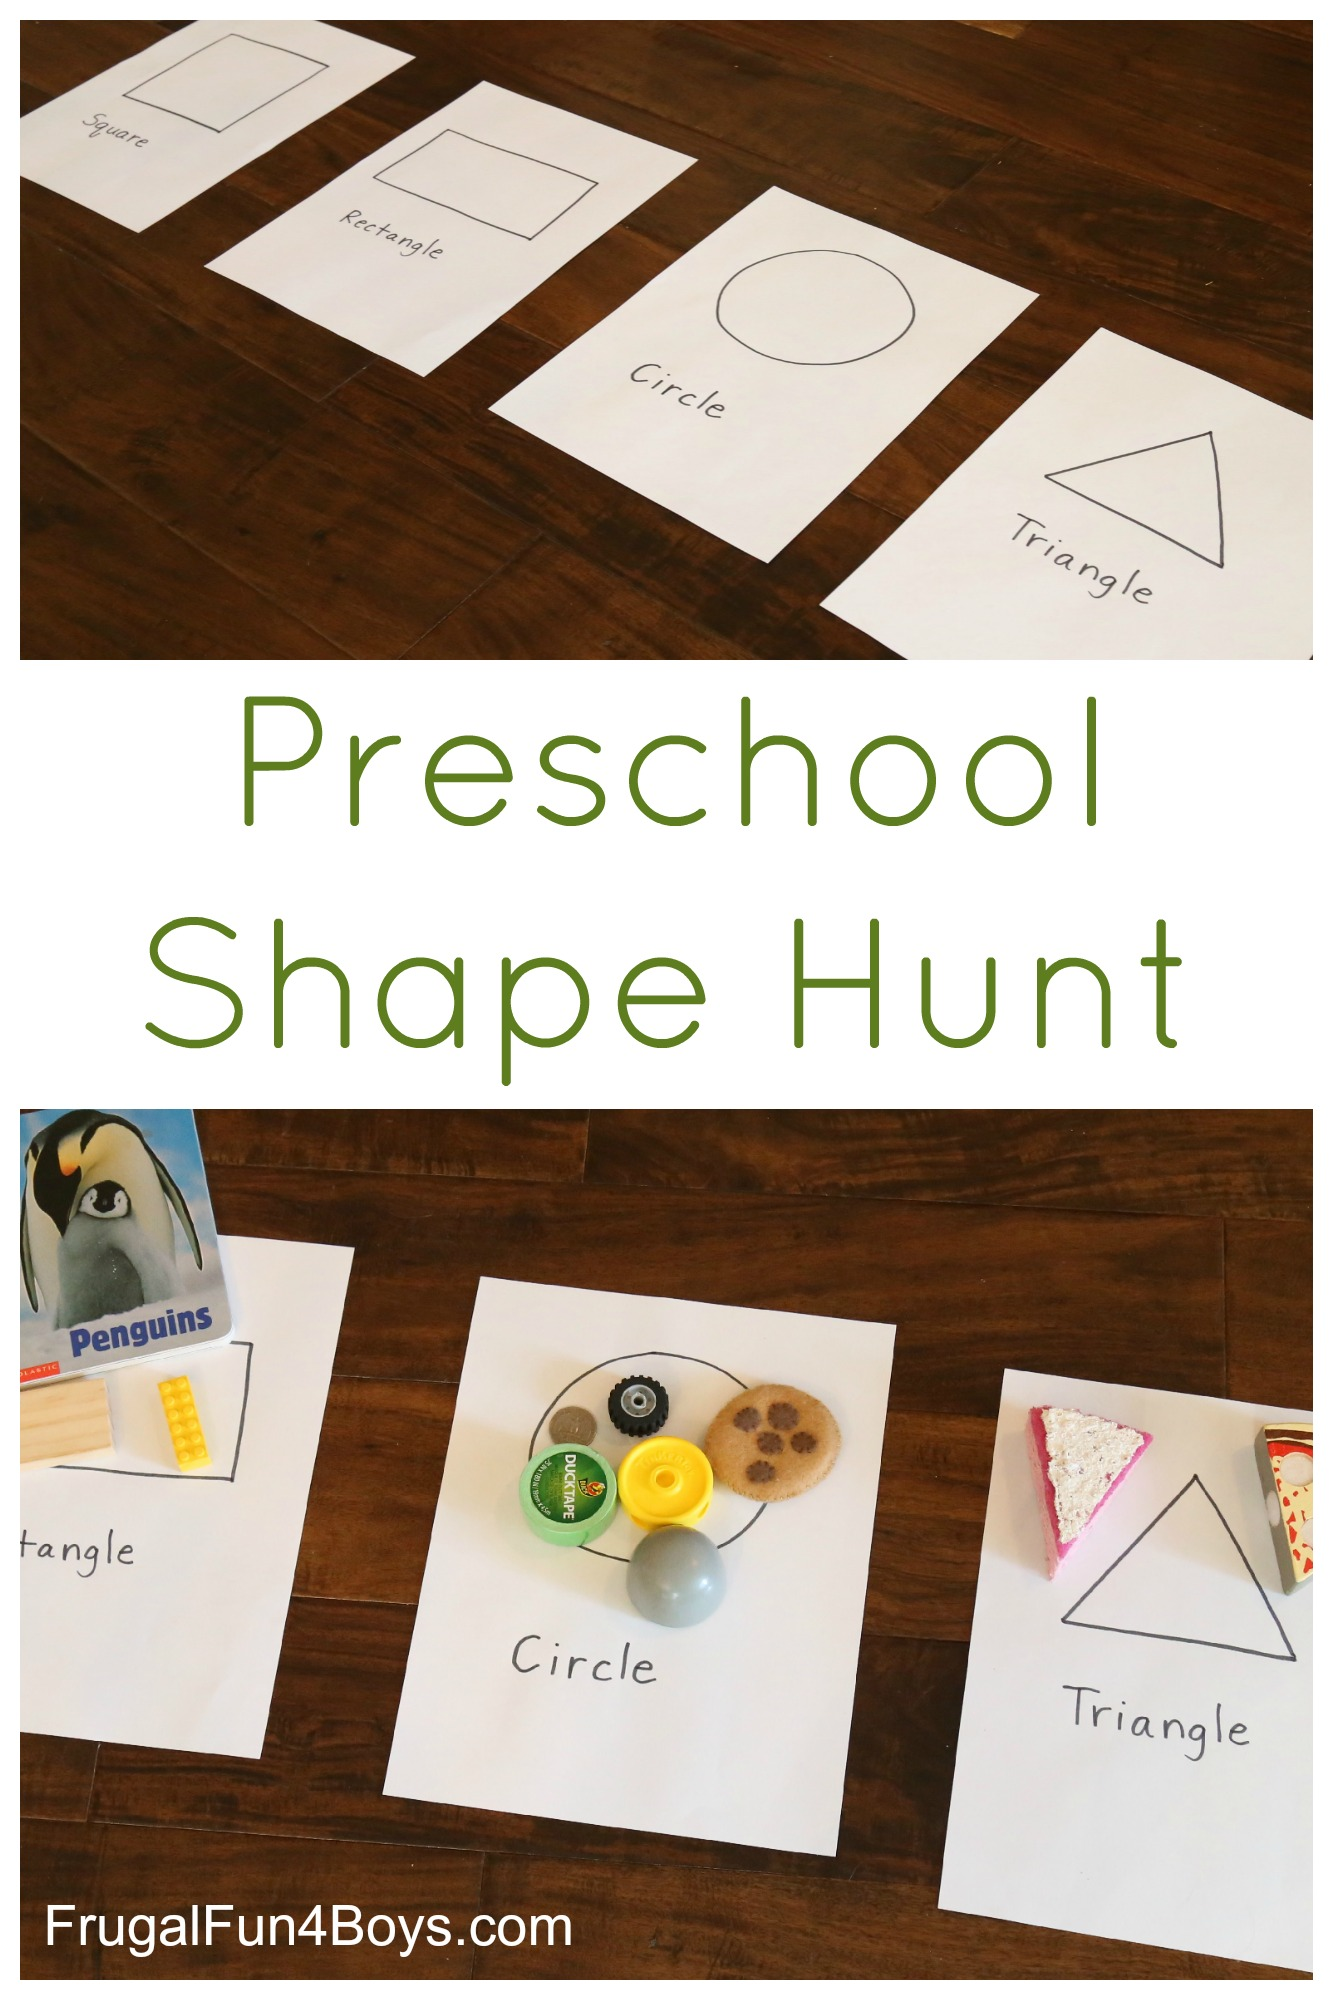 Preschool Shape Scavenger Hunt